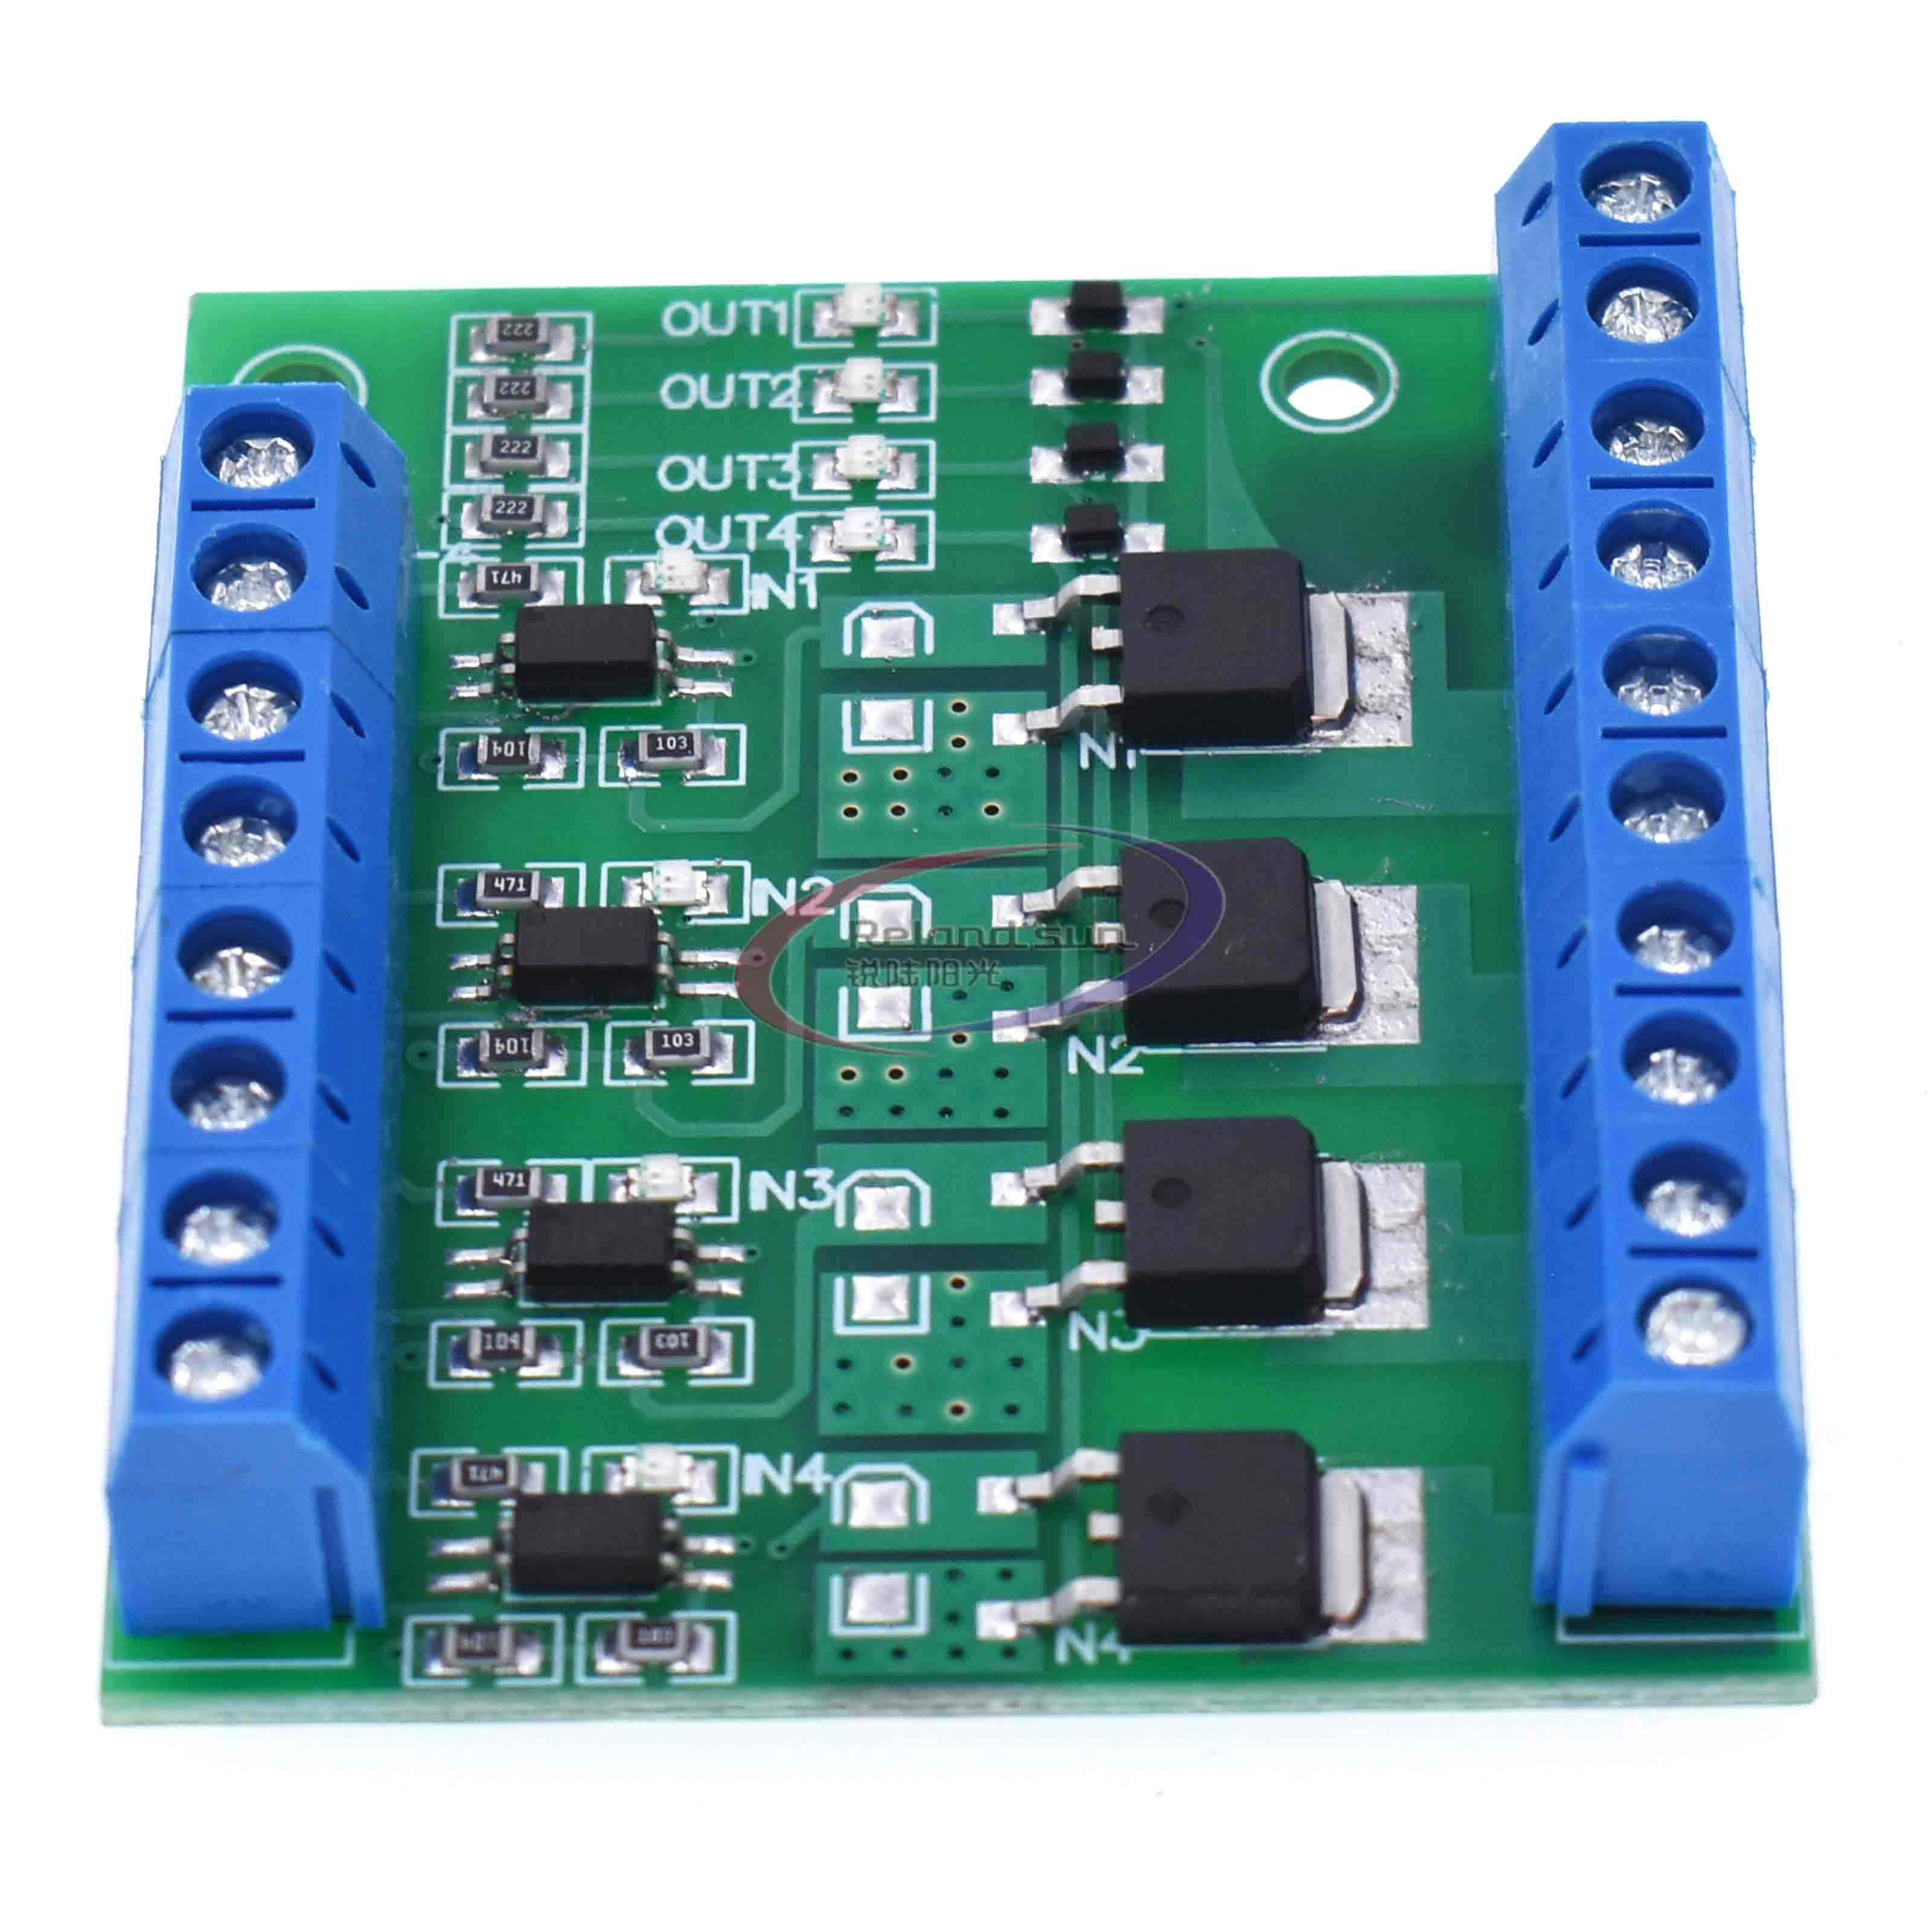 MOS FET F5305S 4 チャンネルパルストリガスイッチコントローラ PWM 入力定常モーターの Led 4 方法 4ch 4 ウェイ diy 電子モジュール